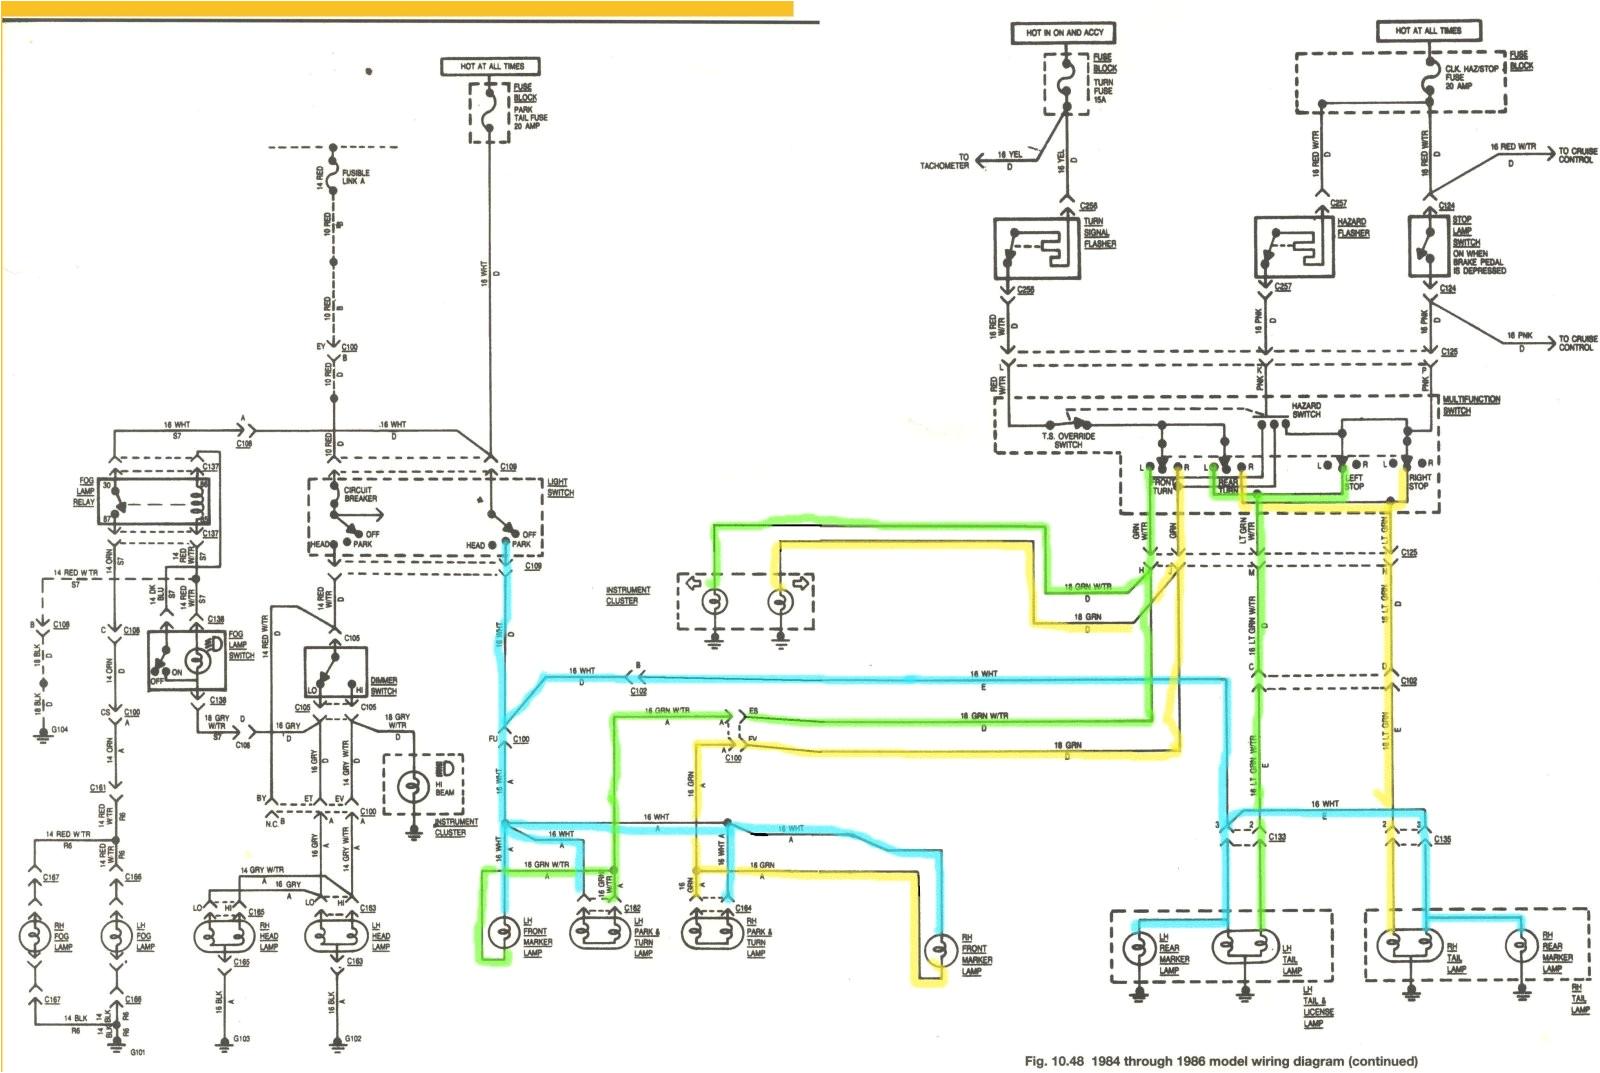 jeep cherokee headlight switch wiring diagram awesome headlight dimmer switch wiring diagram elvenlabs of jeep cherokee headlight switch wiring diagram jpg